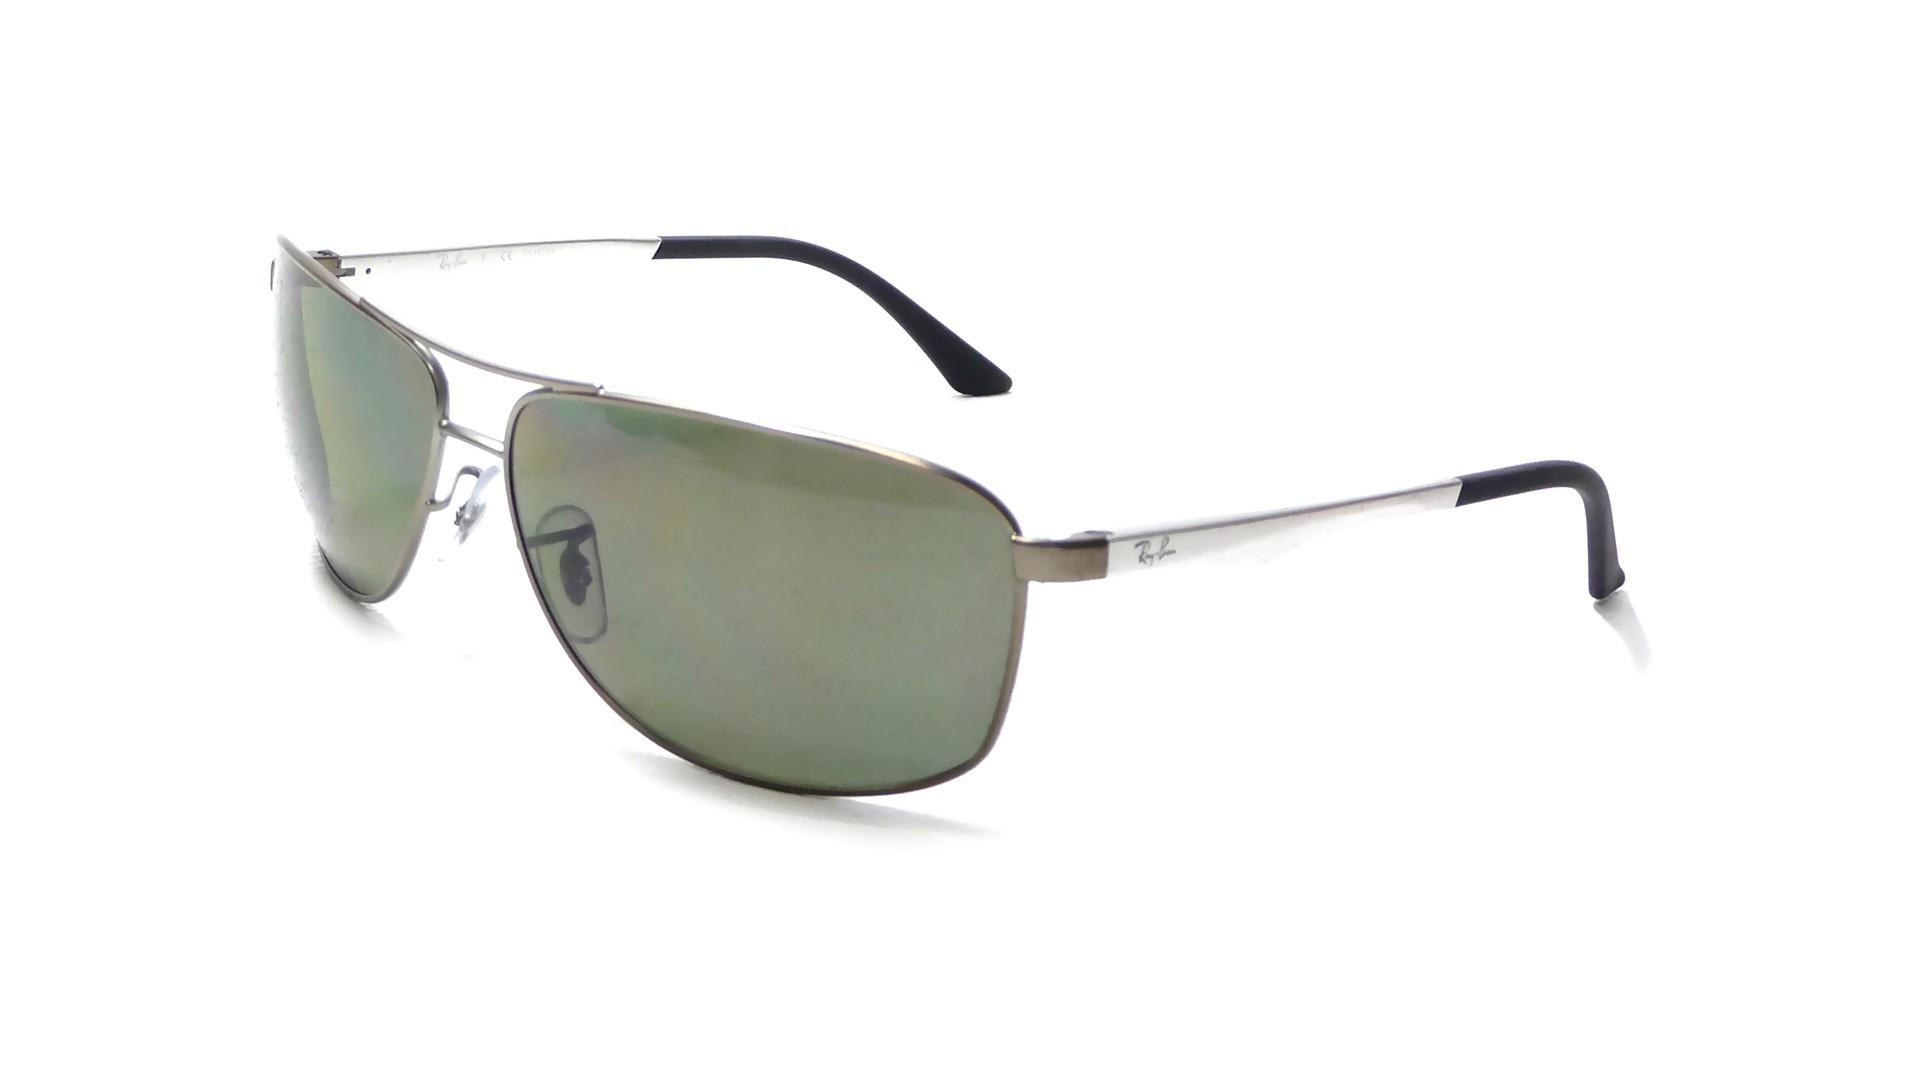 c721cb03dd Sunglasses Ray-Ban RB3506 029 9A 64-13 Silver Large Polarized